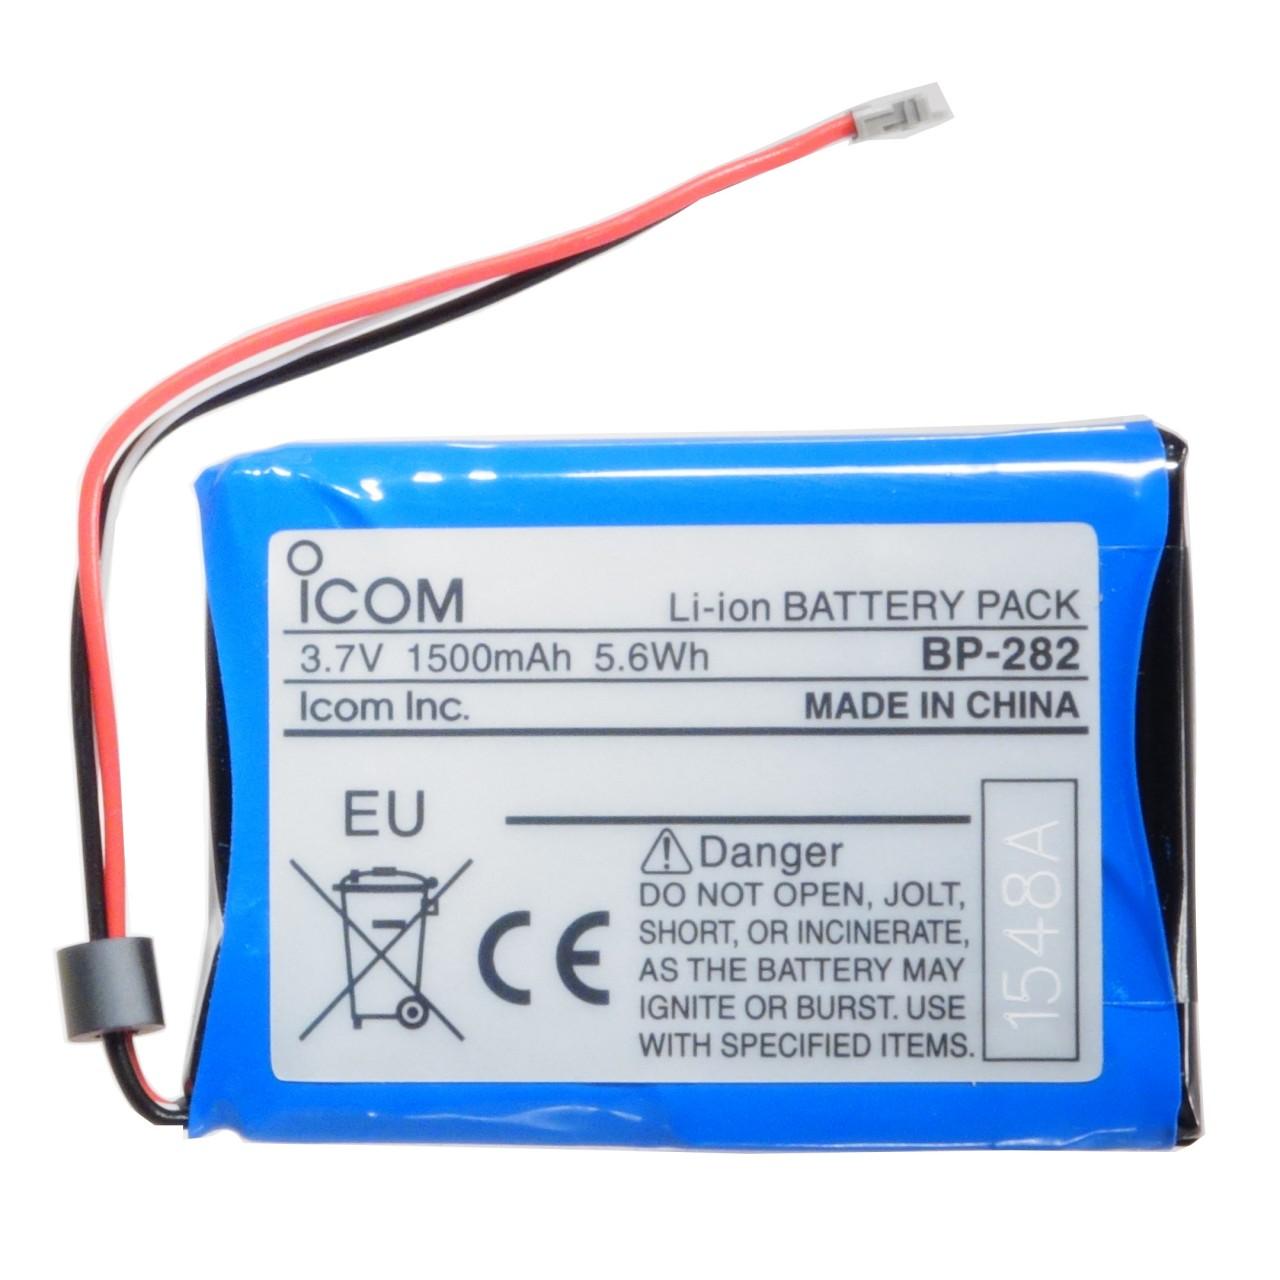 BP-282 Batteries - ICOM